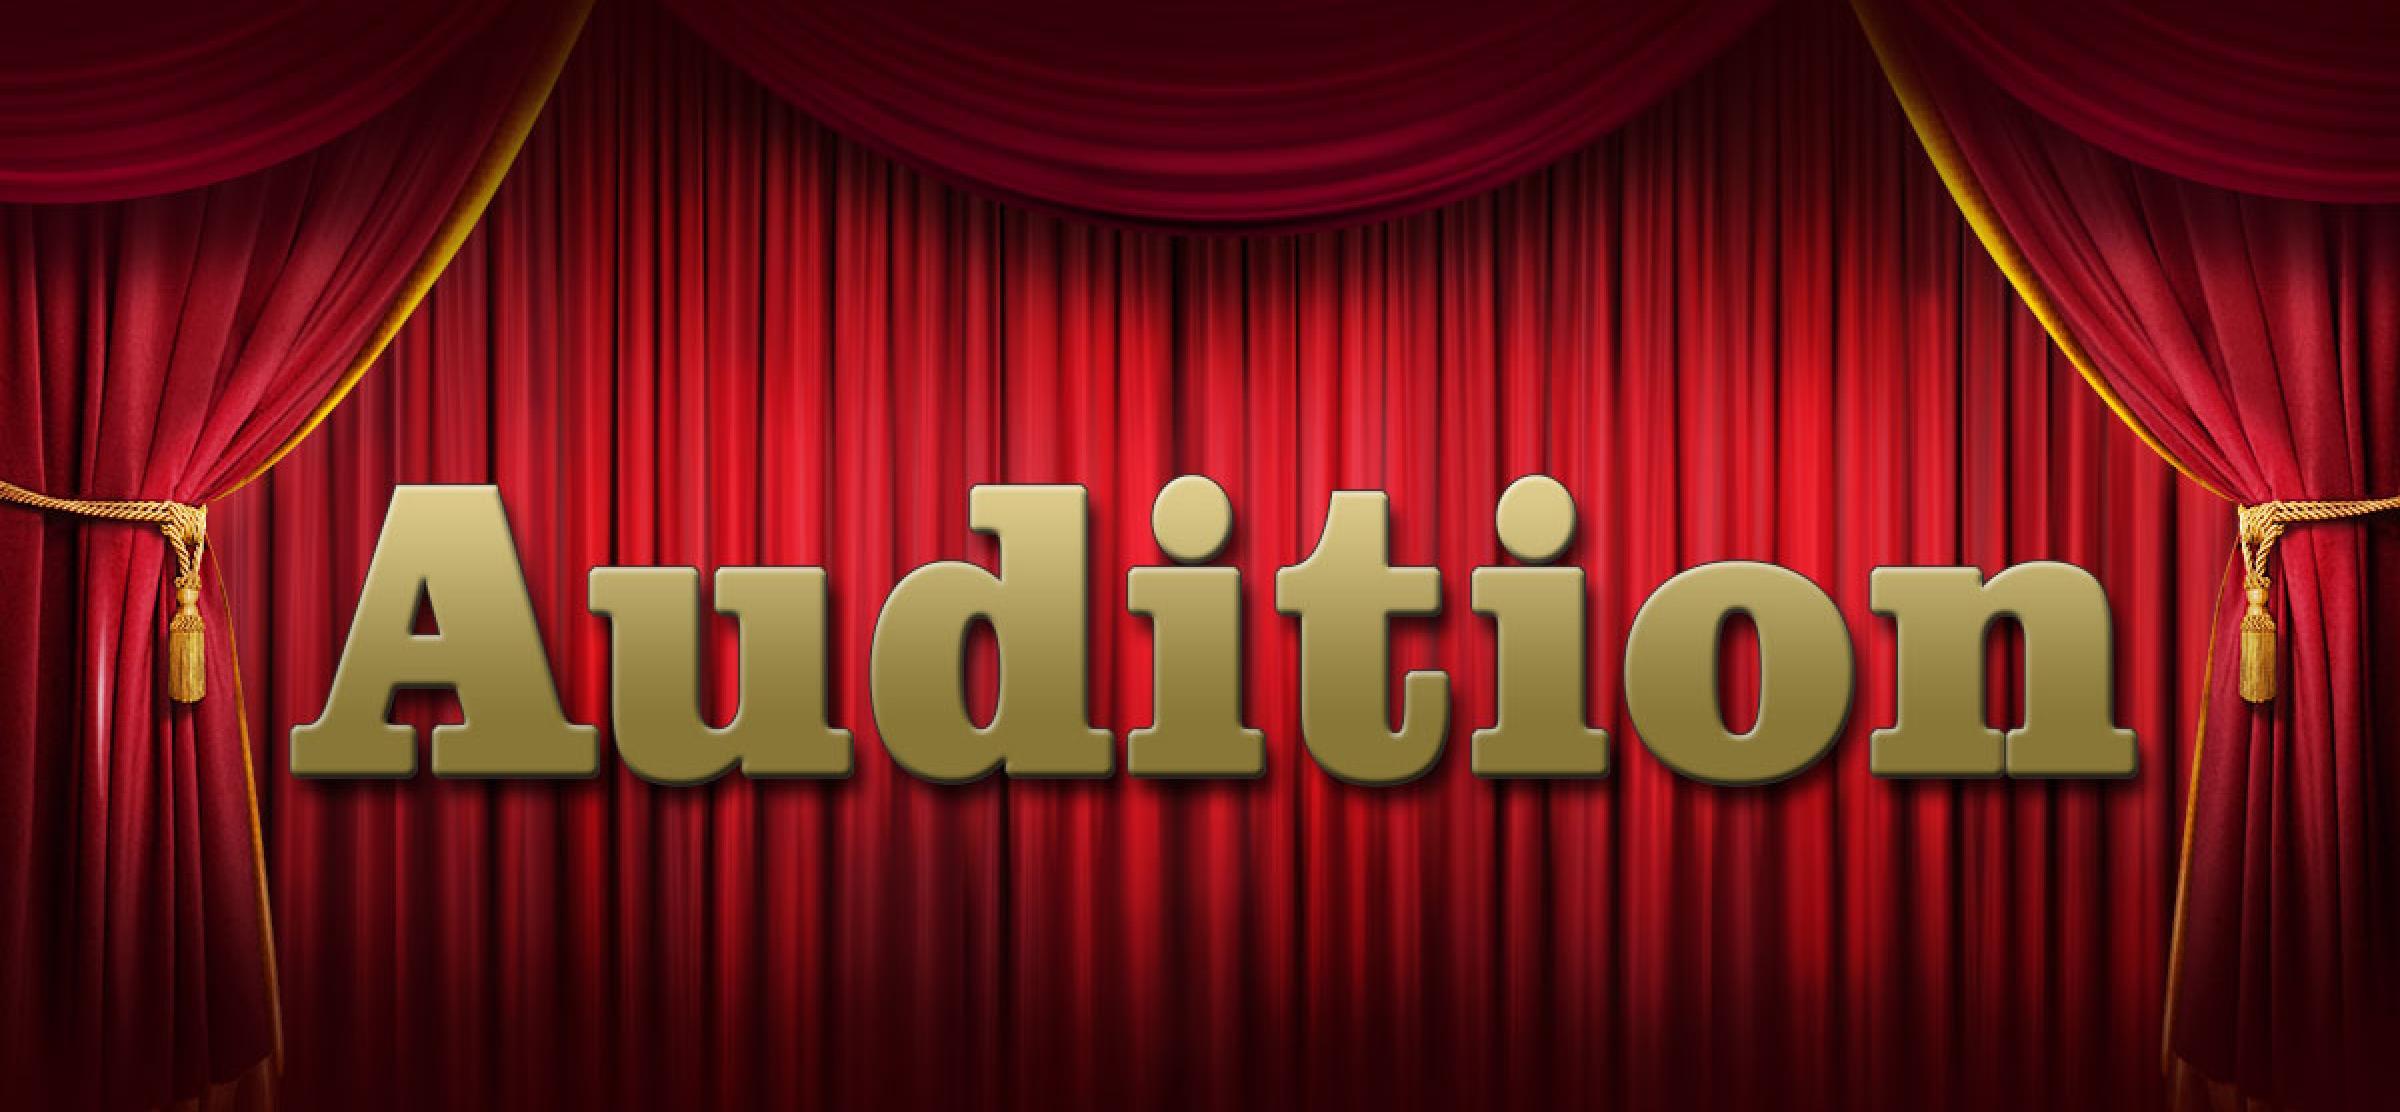 Nollywood Registration form. Nollywood audition form